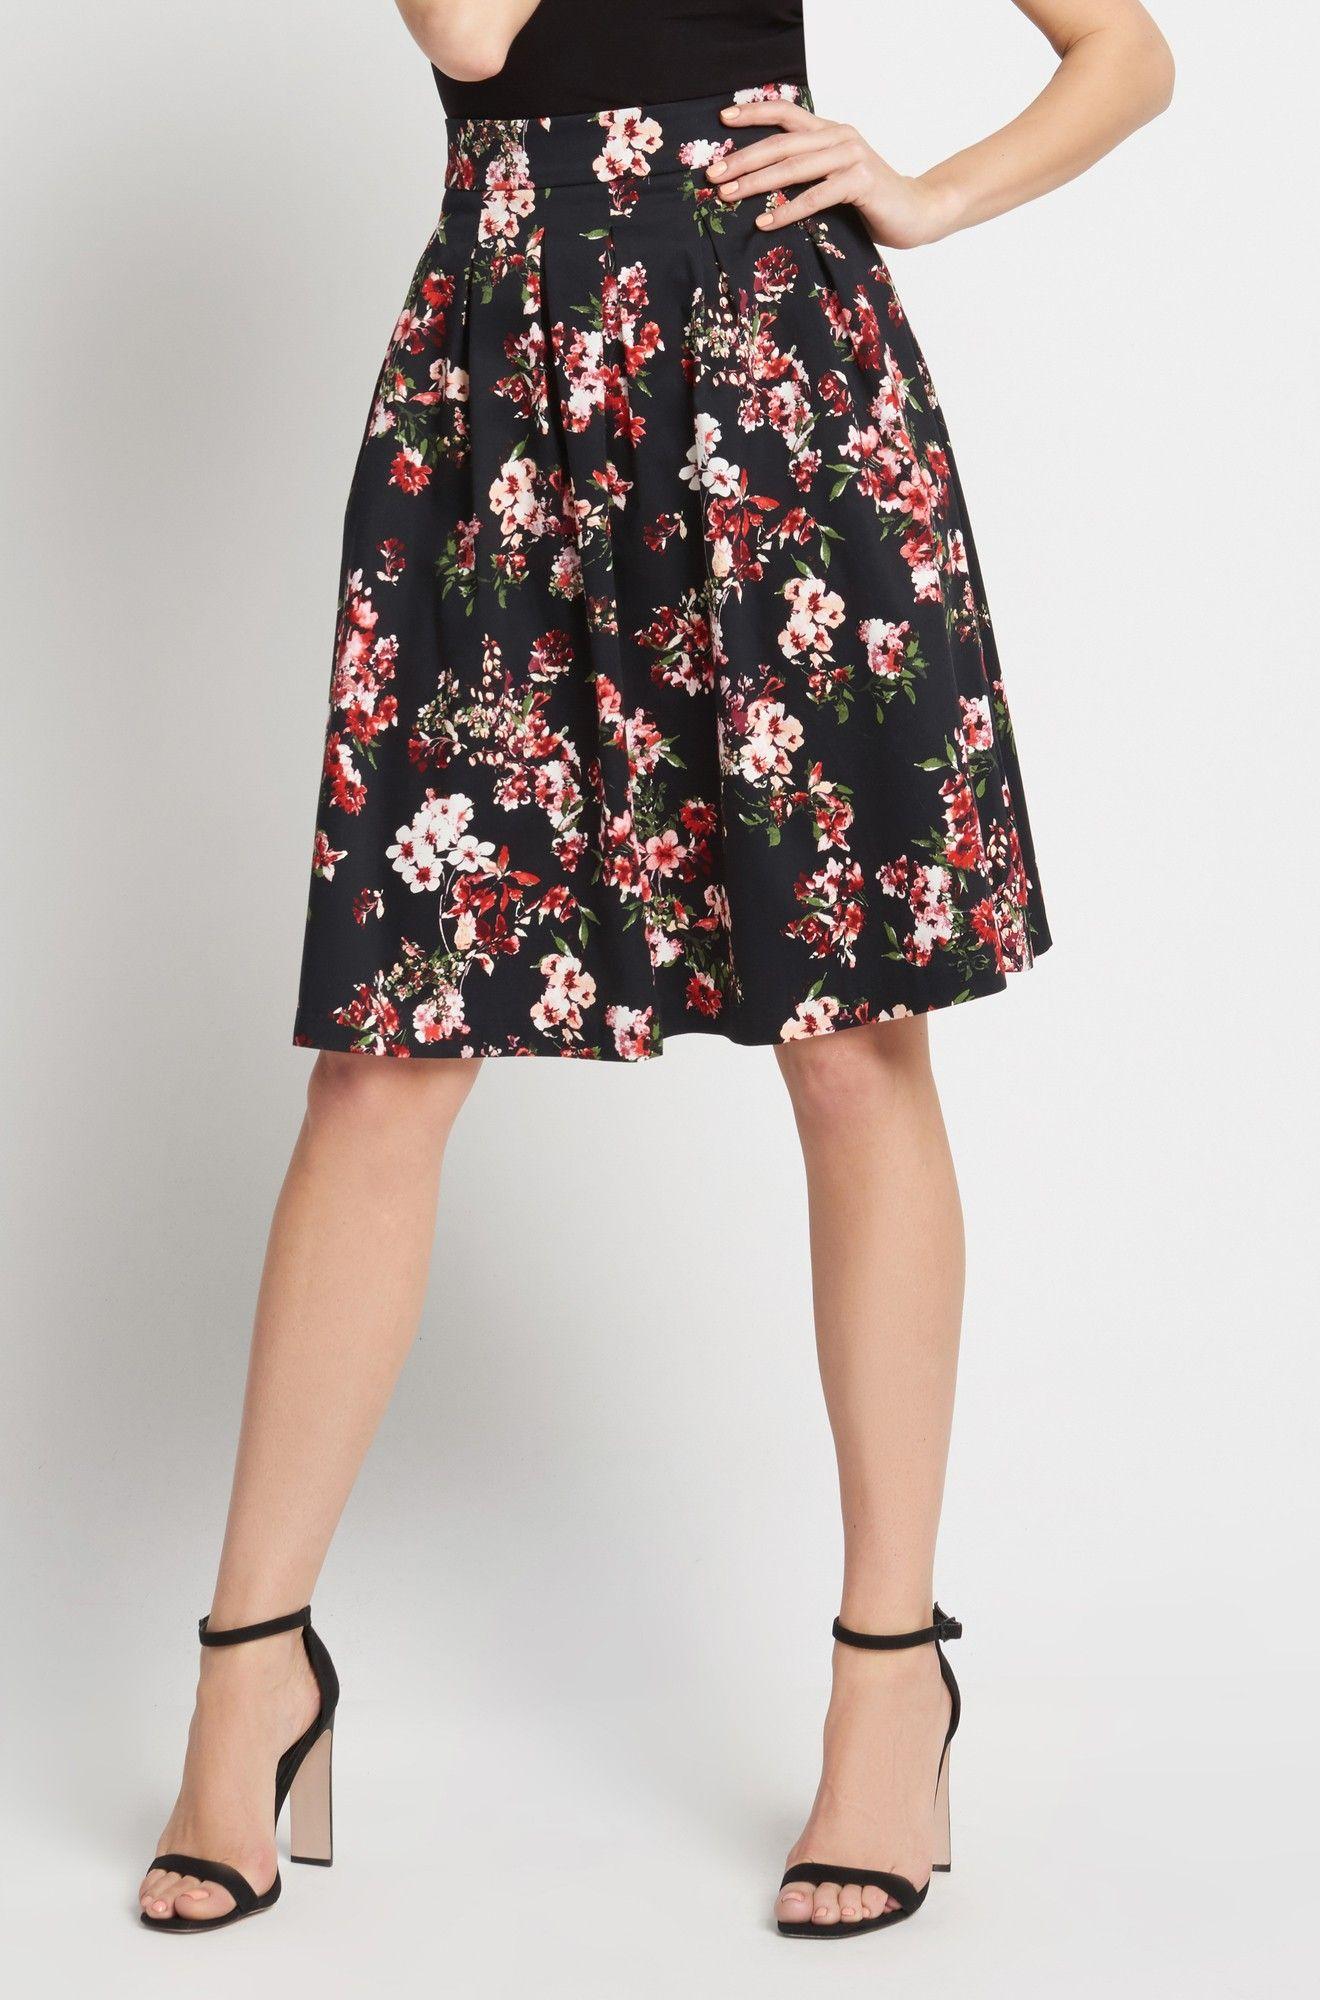 Glockenrock mit Blumen-Muster | Fashion | Pinterest | Glockenrock ...